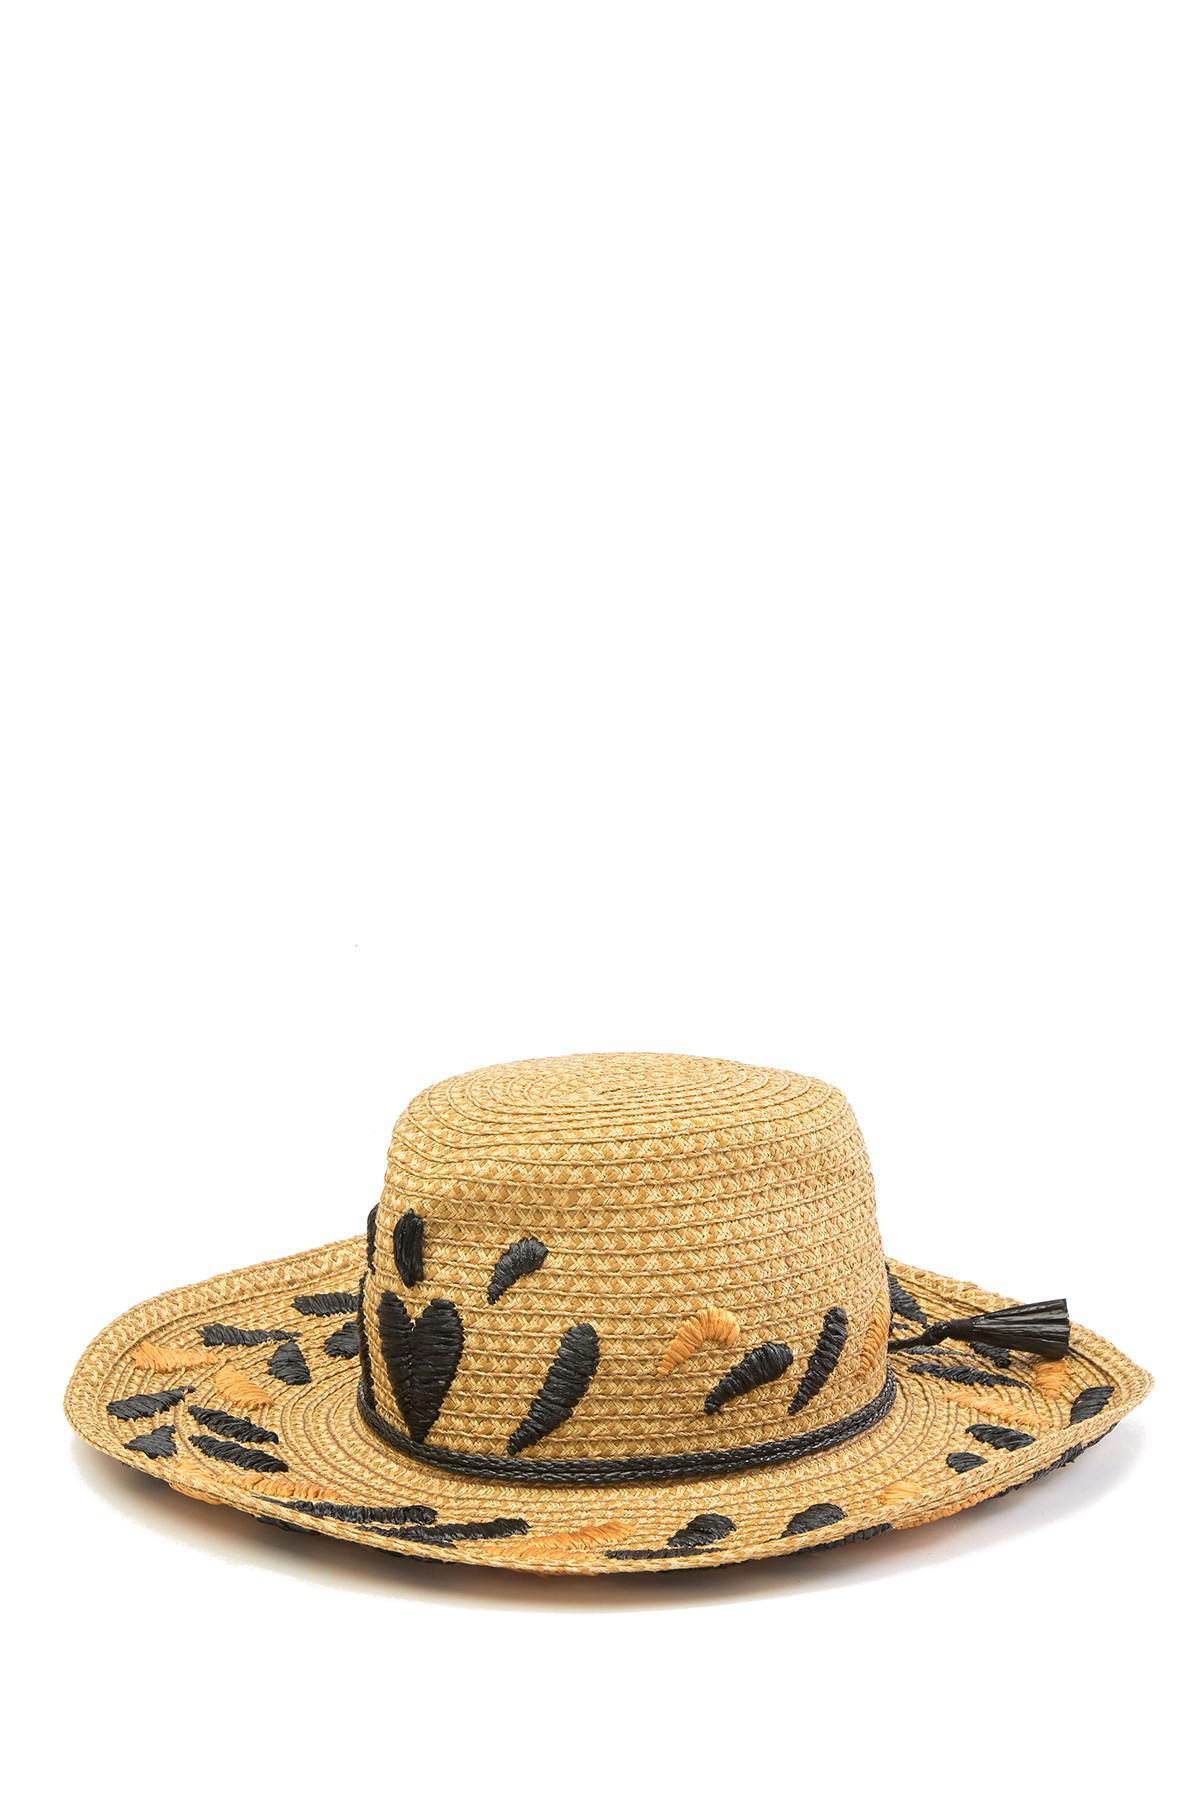 2f969a2a38d Lyst - Eric Javits Corsica Patterned Cowboy Hat